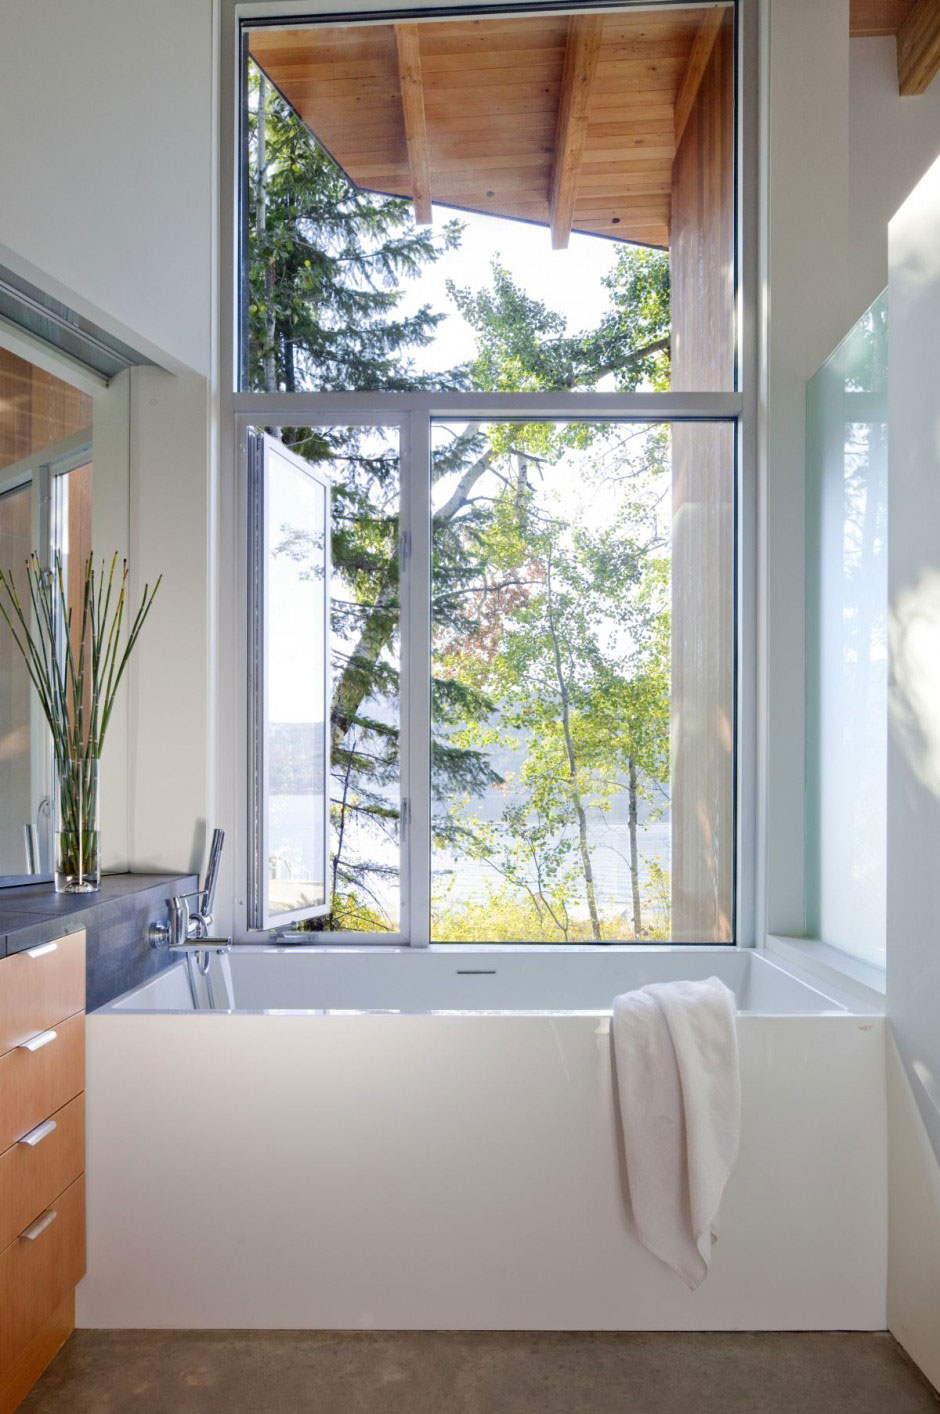 Mminimalist Bathrooms of Shuswap Cabin by Splyce Design